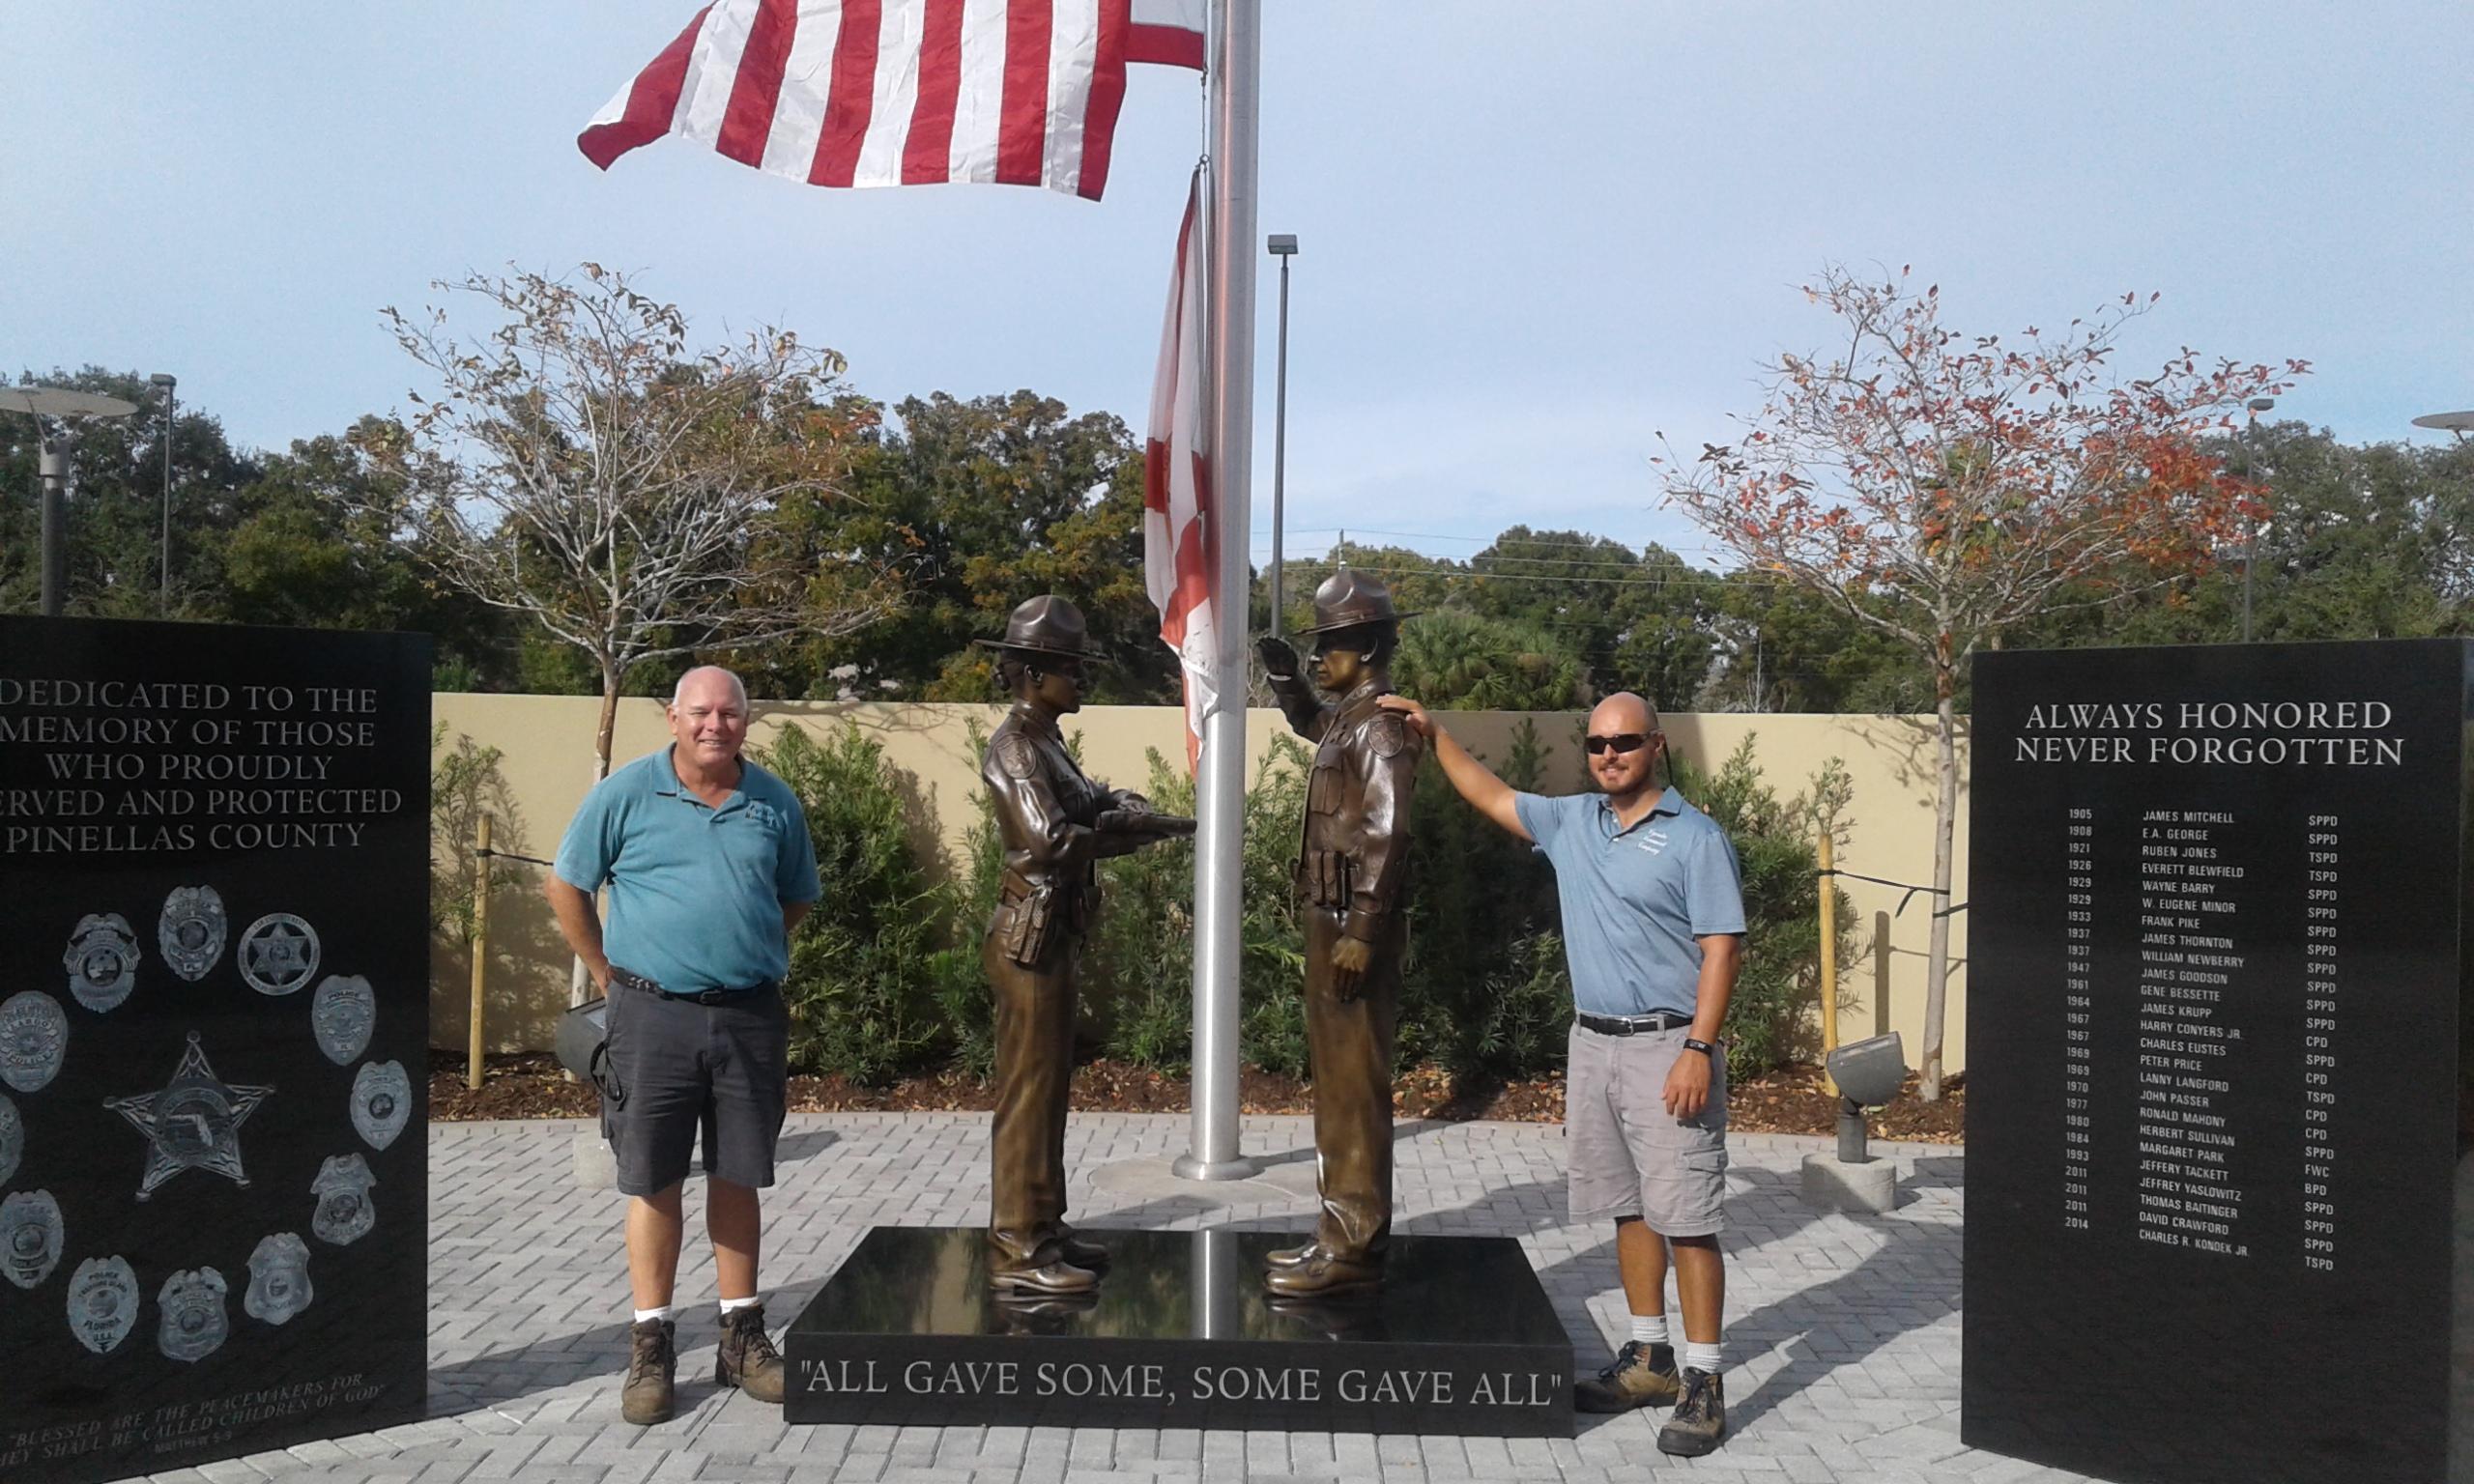 Black Granite Fallen Officer Memorial Bronze Statues Pinellas County Sheriff